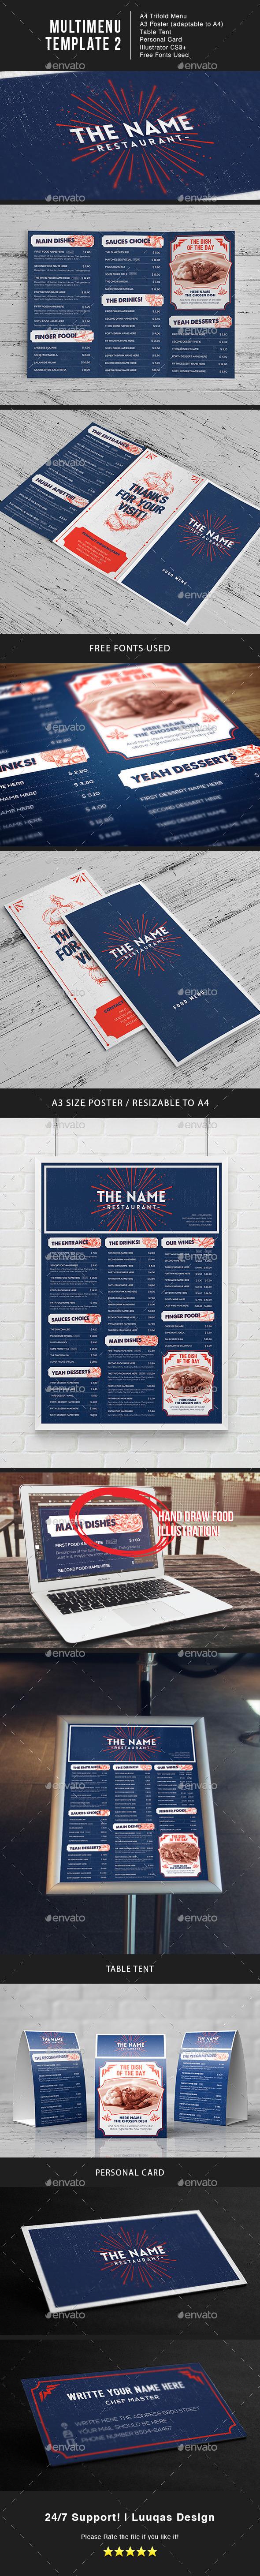 Multi Menu Illustrator Template 2 - Food Menus Print Templates